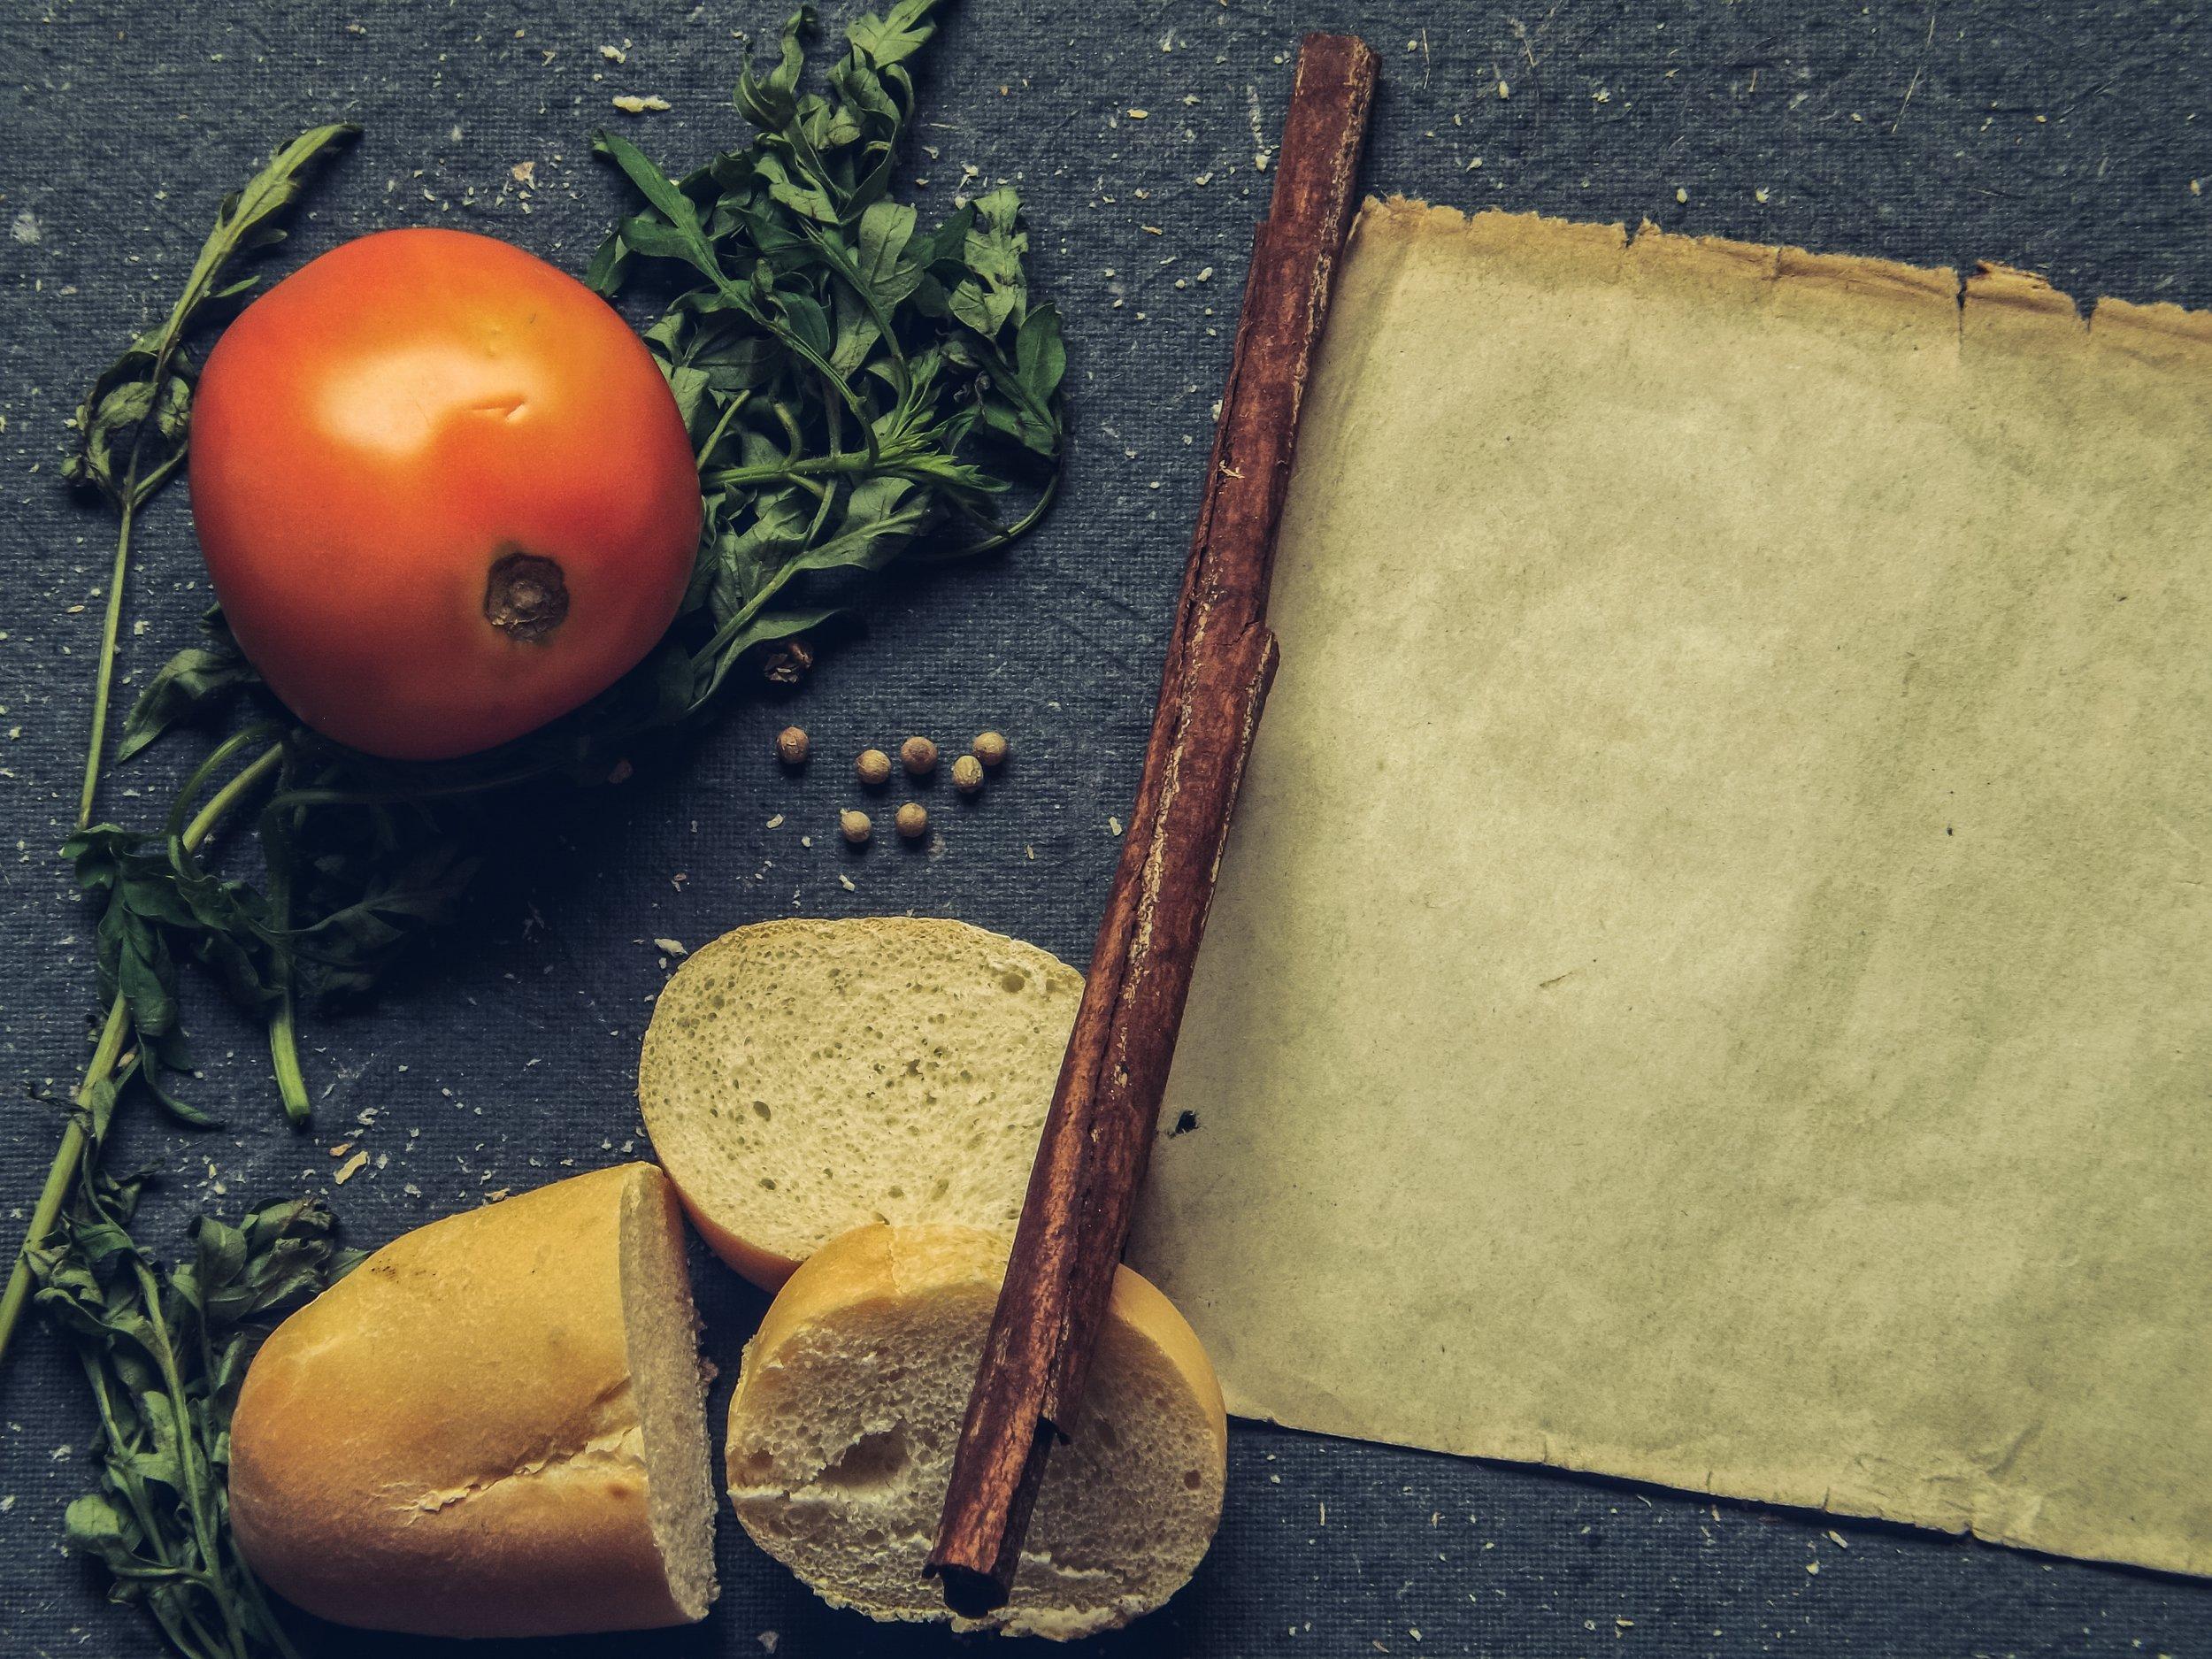 tomato and bread.jpeg